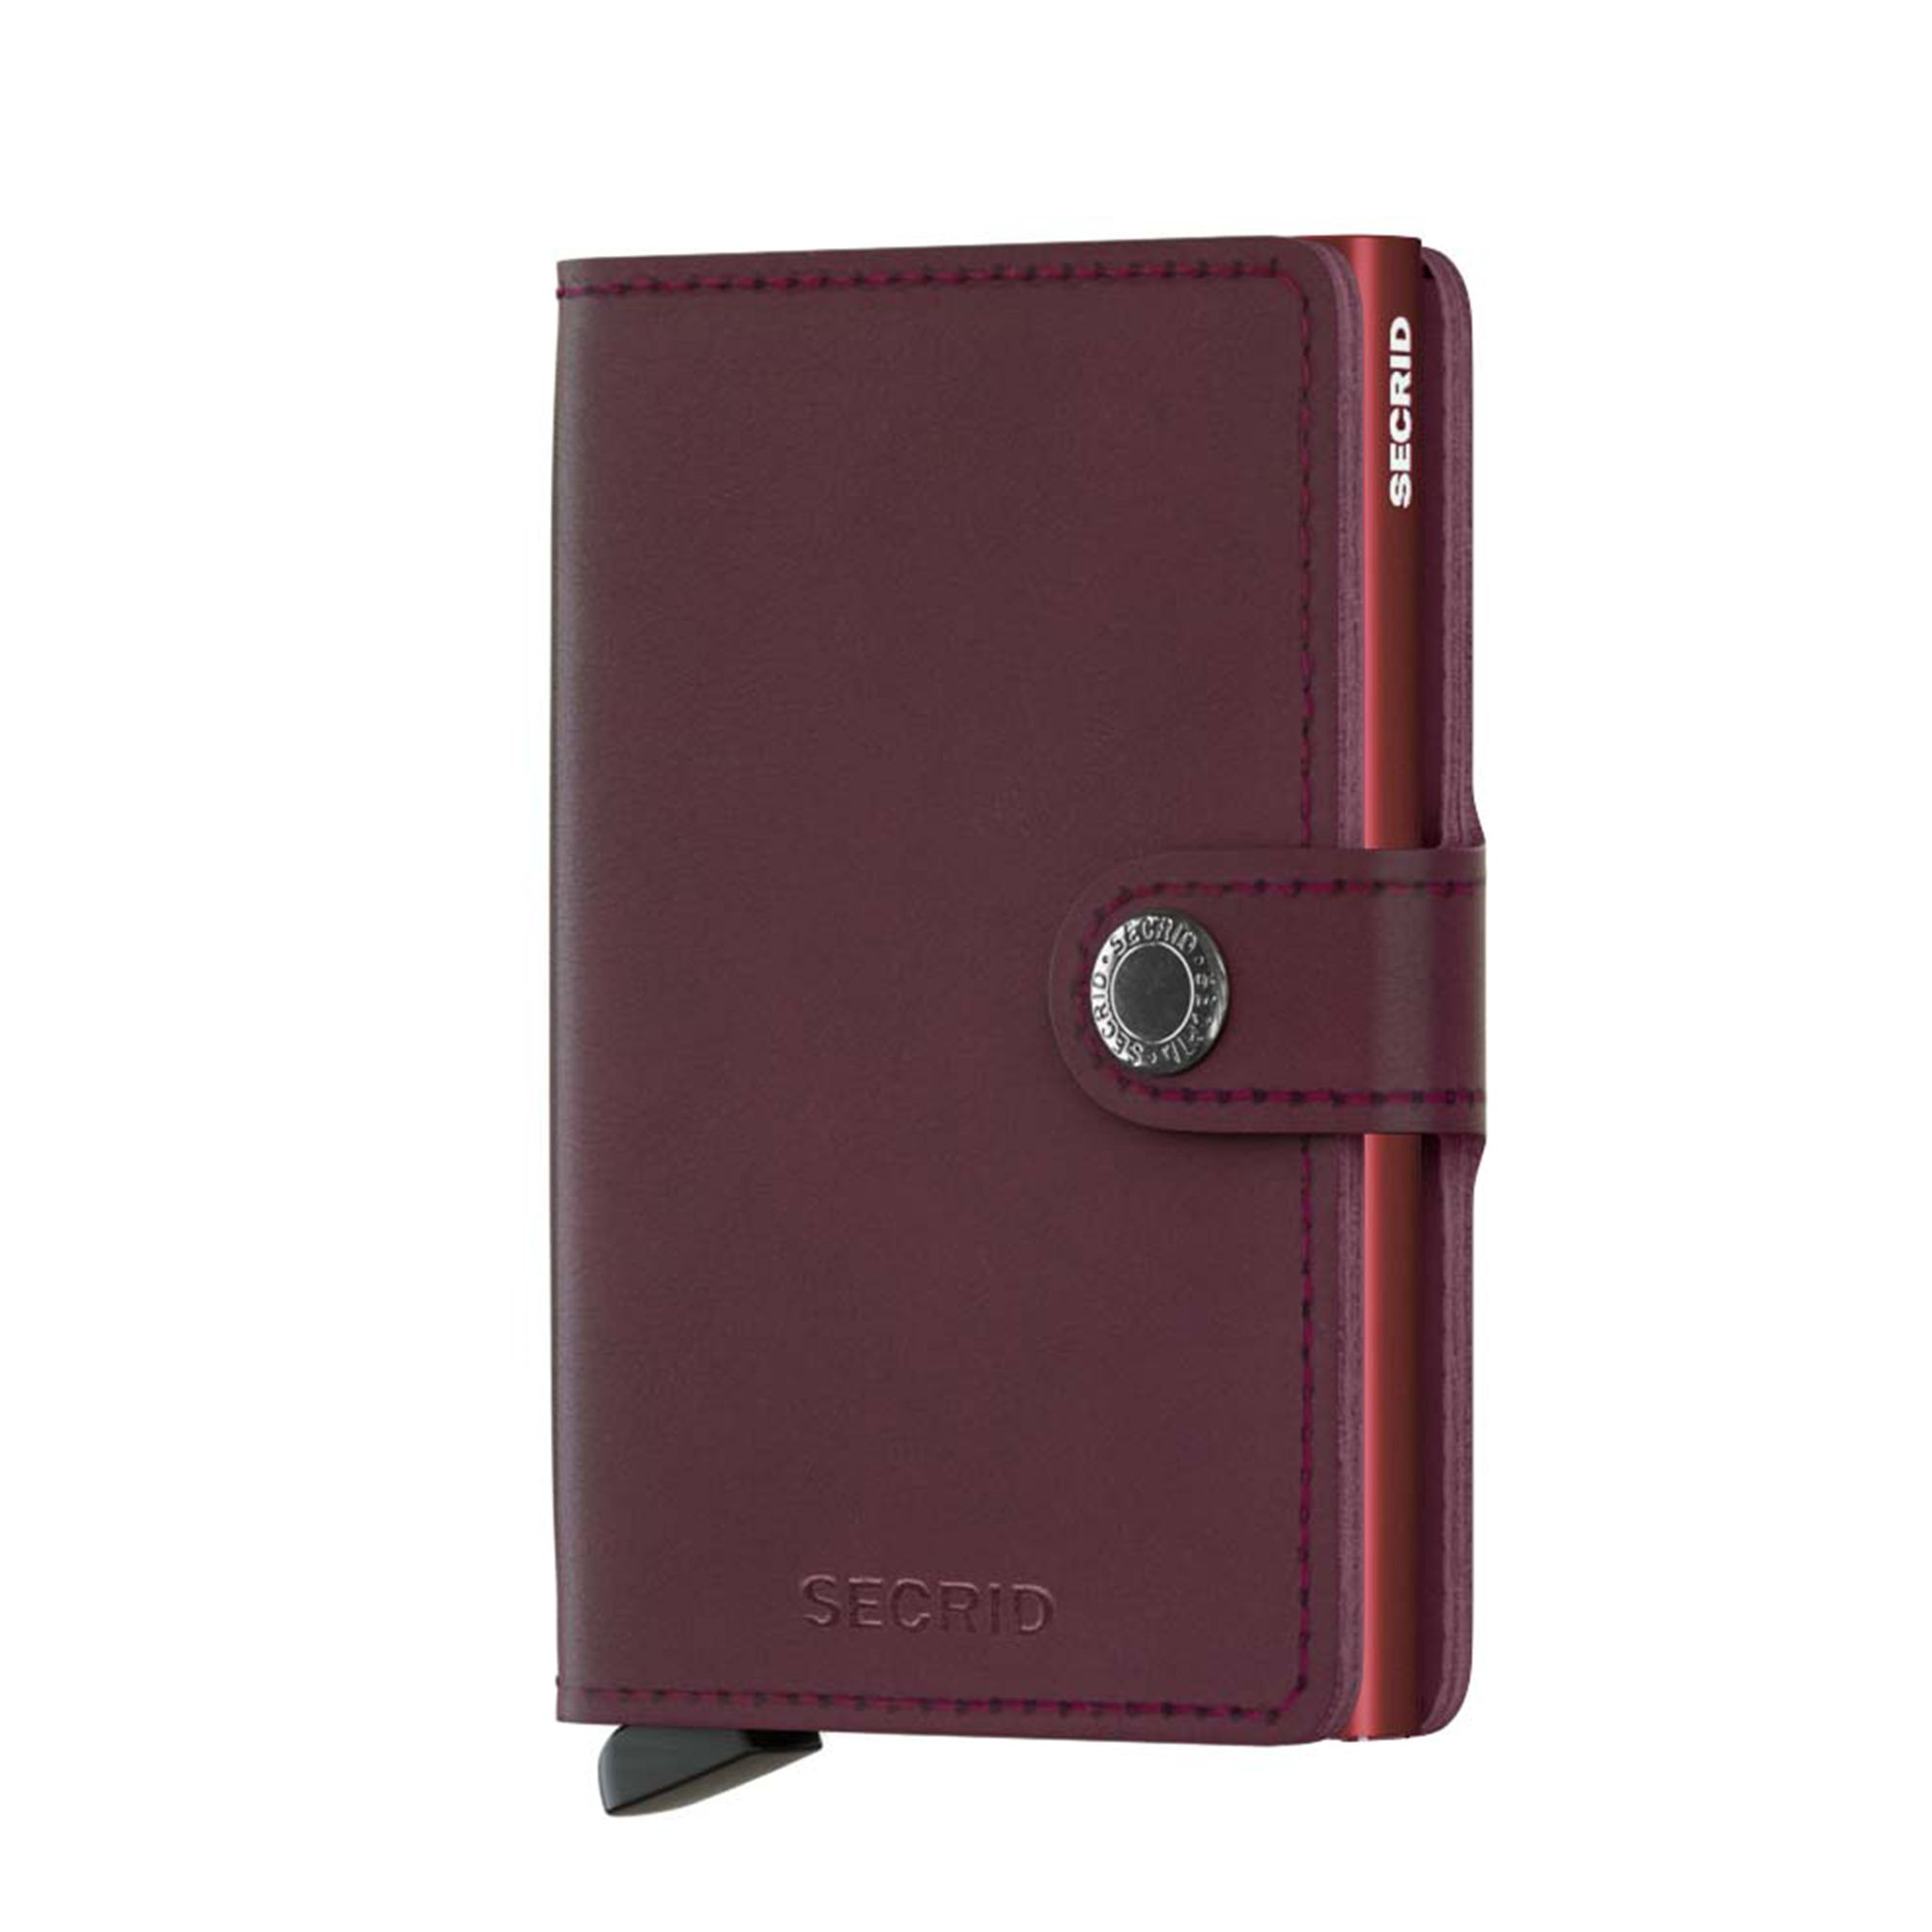 Secrid liten plånbok i skinn och metall, Bordeaux